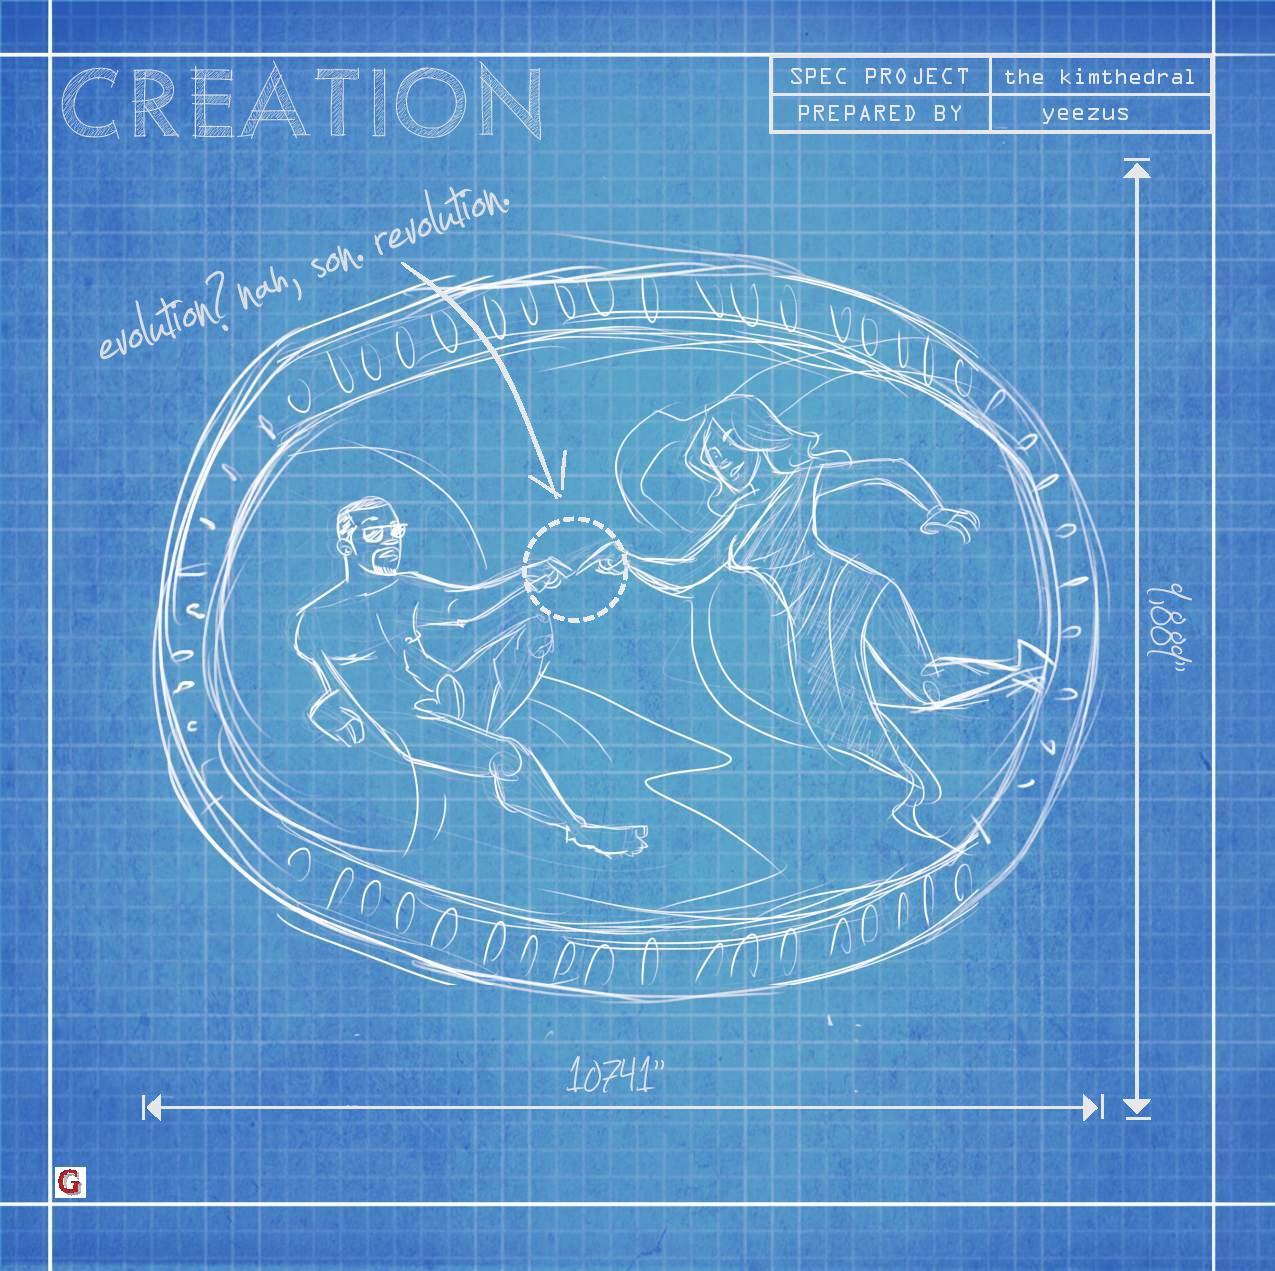 Kanye Creation edit.compressed-page-001